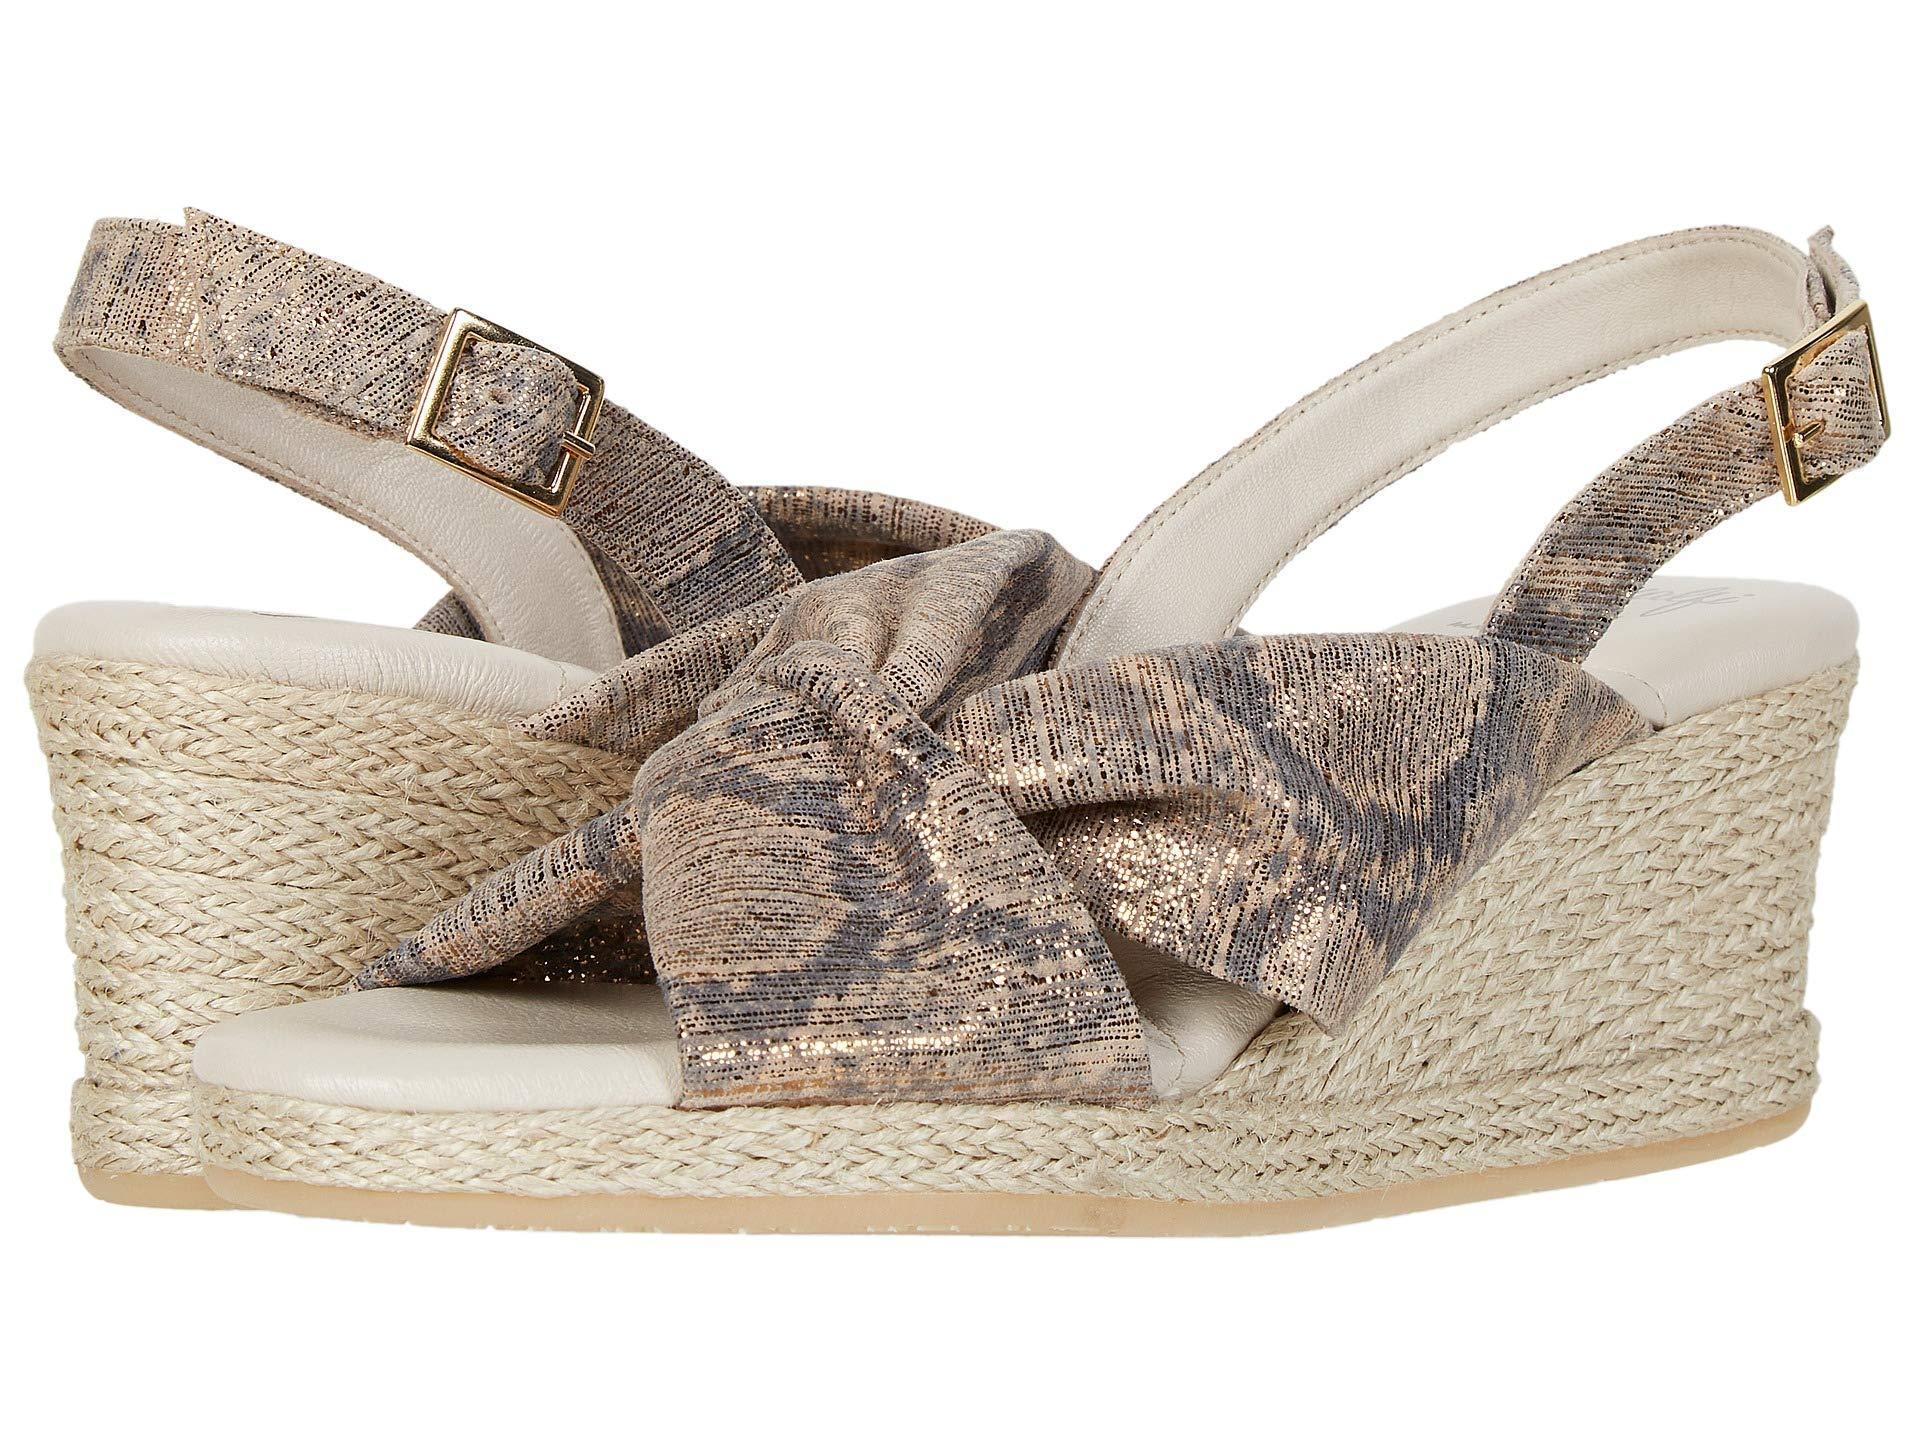 06121aeb0 Lyst - Amalfi by Rangoni Laerte (bronzo Animal Suede) Women s Shoes